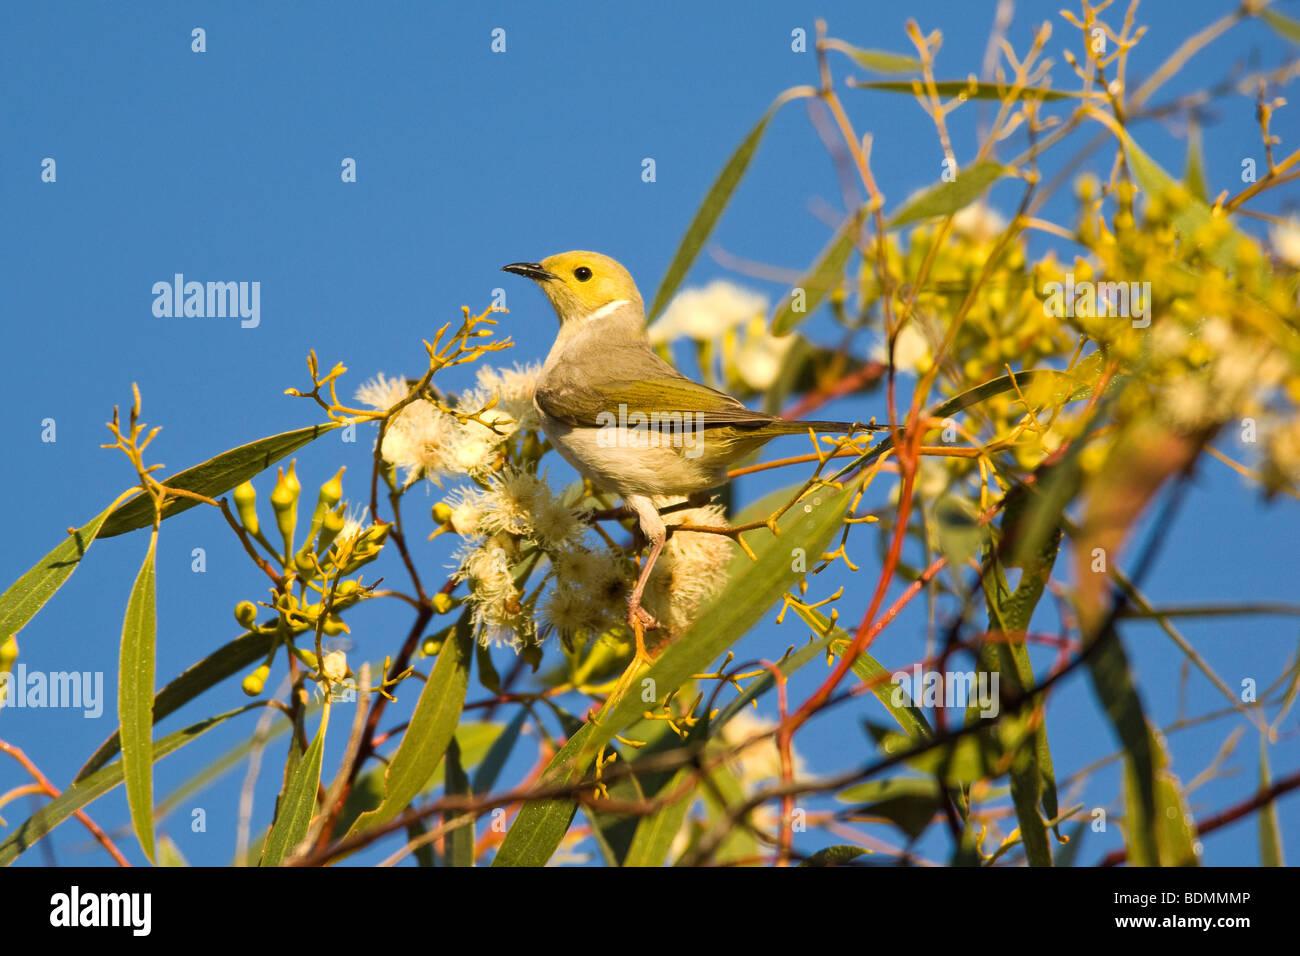 White-plumed Honeyeater, Wanaaring, New South Wales, Australia - Stock Image